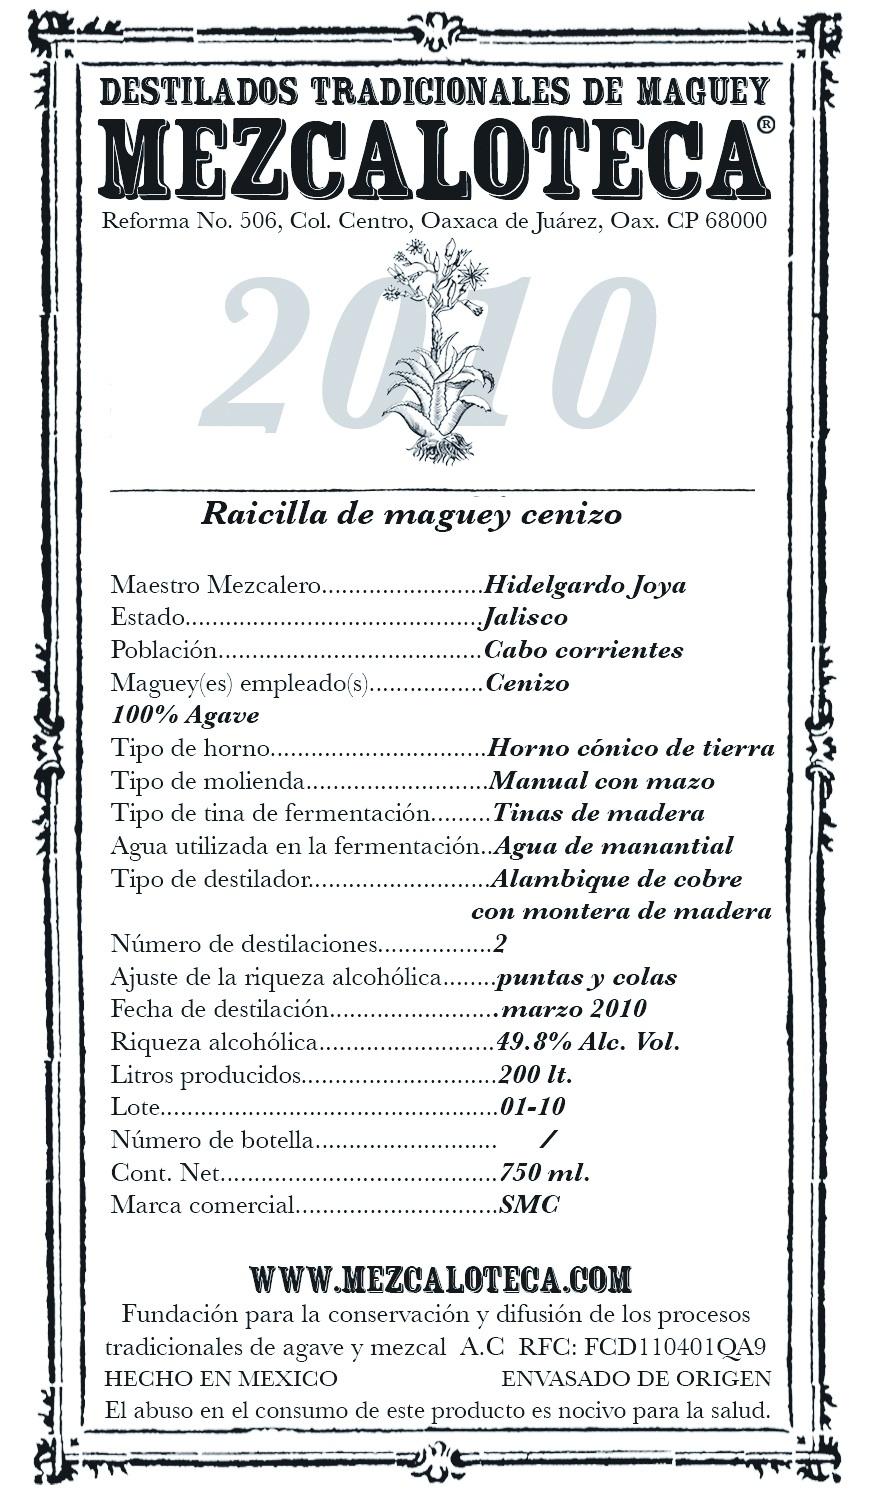 raicilla.jalisco.HJ.2010.750[1] web.jpg